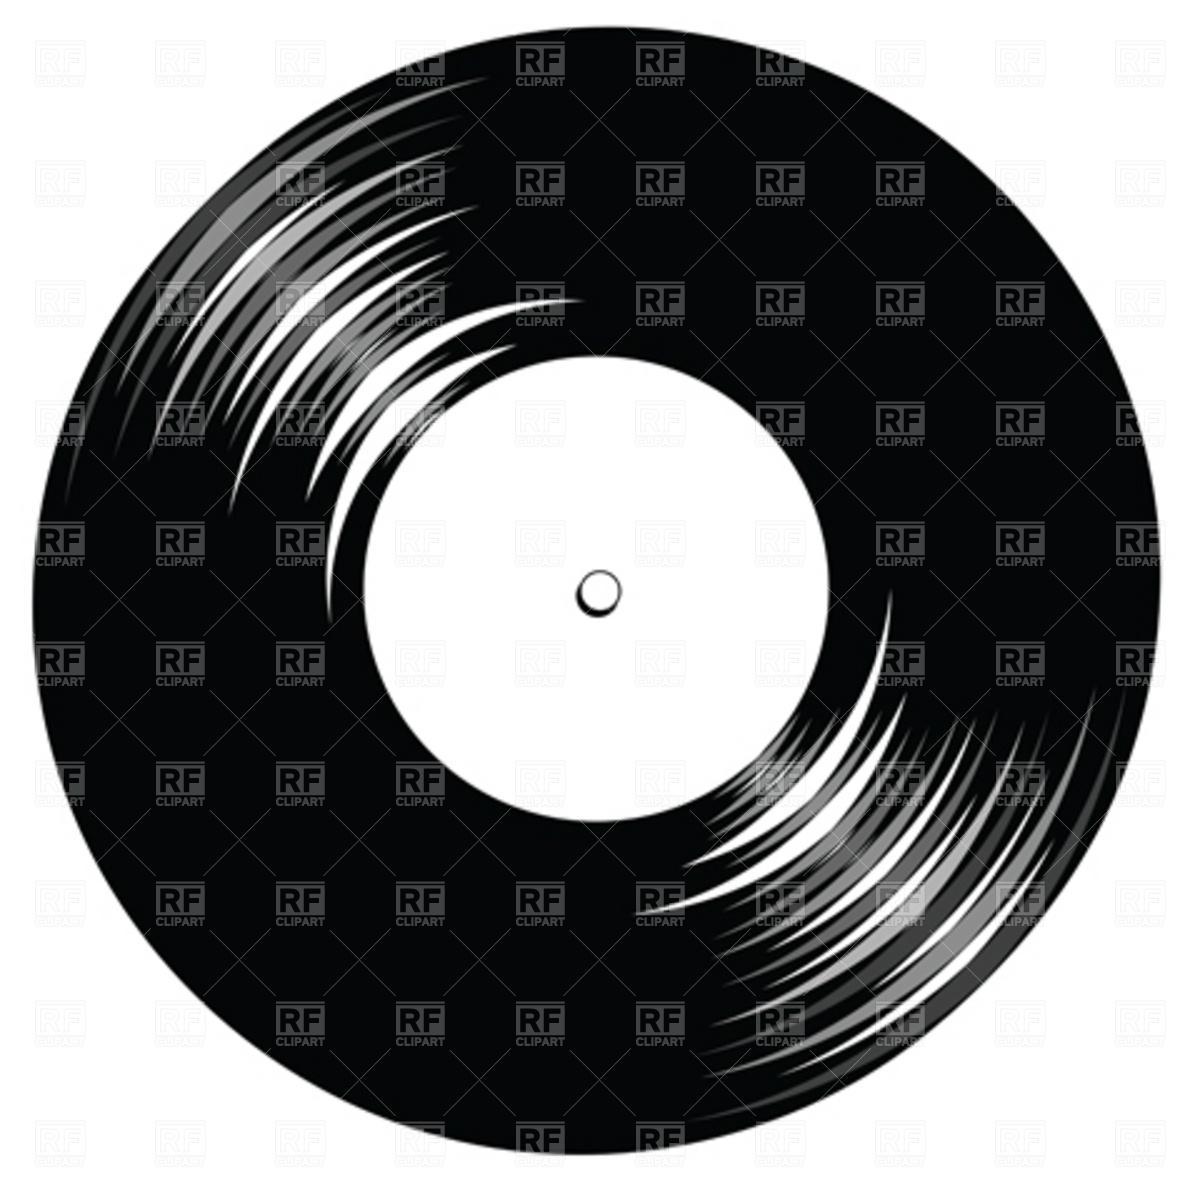 Lp Record Clipart.